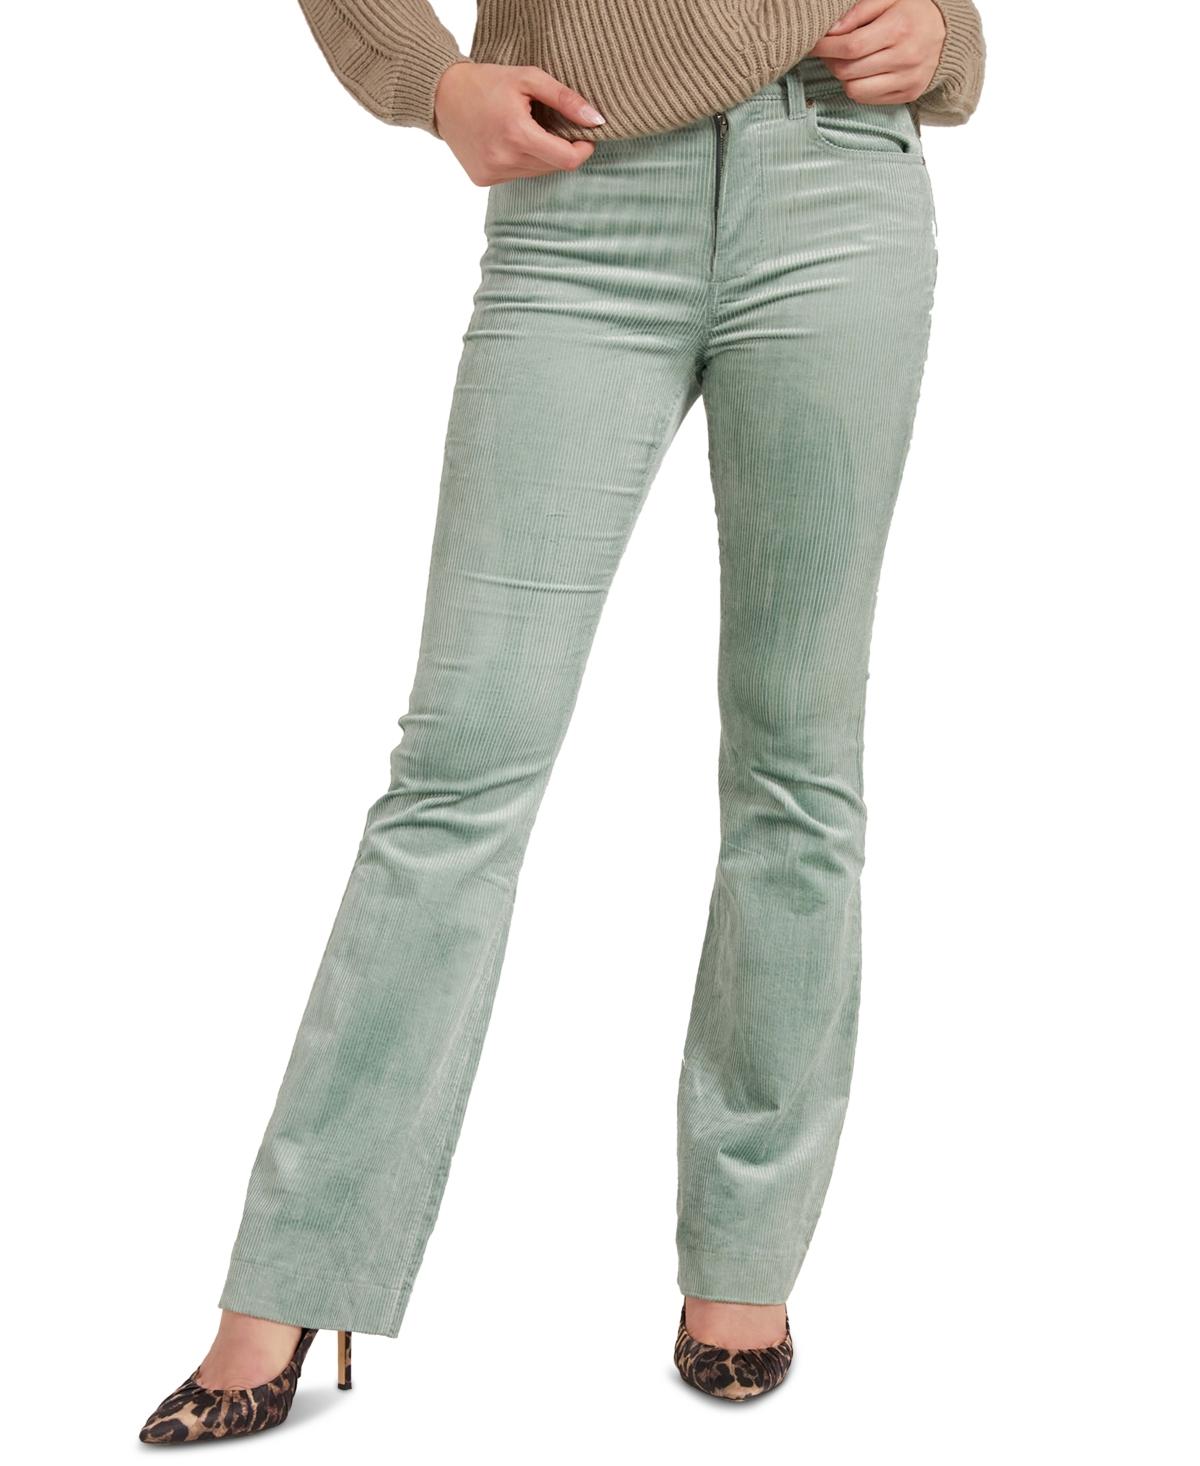 60s Pants, Jeans, Hippie, Flares, Jumpsuits Guess Pop 70s High Waisted Corduroy Pants $82.60 AT vintagedancer.com